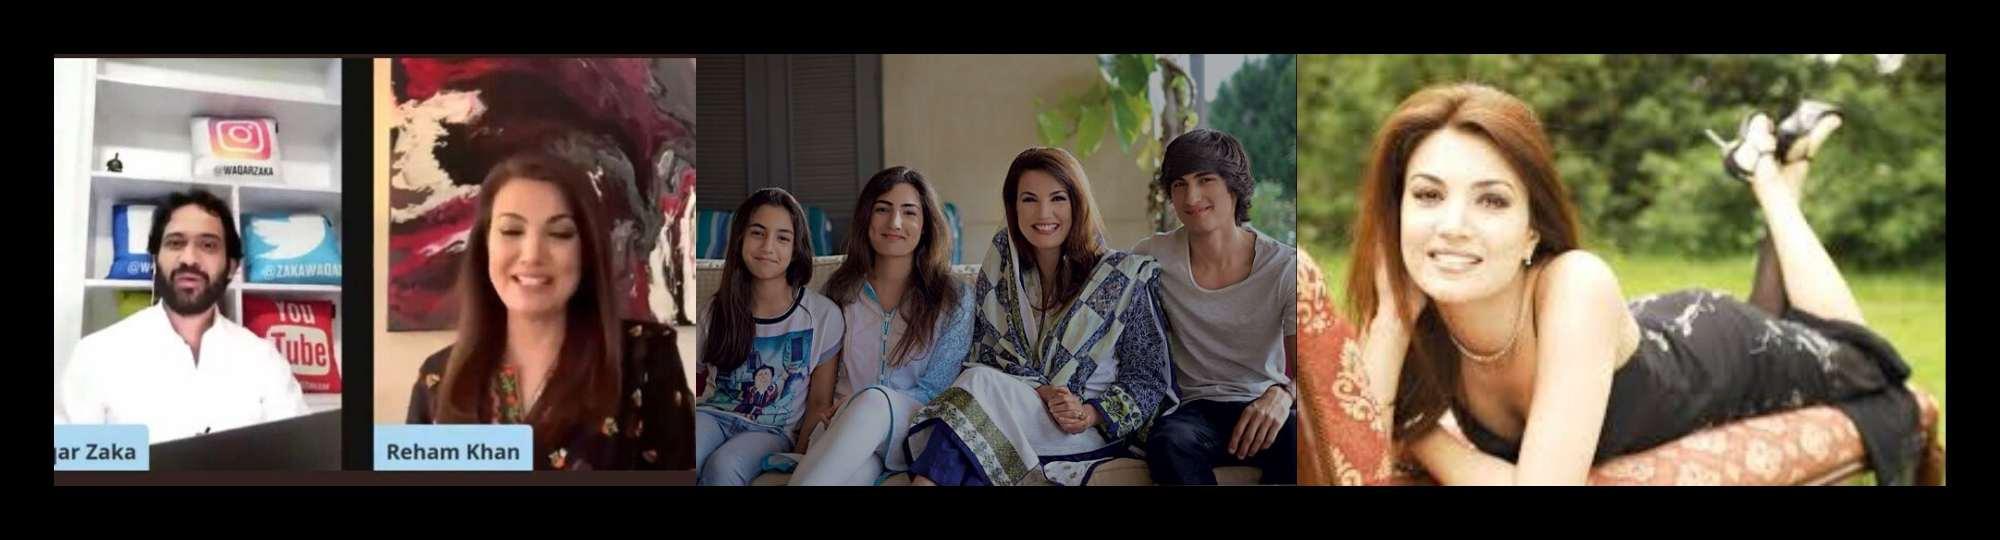 reham khan sex life with imran khan